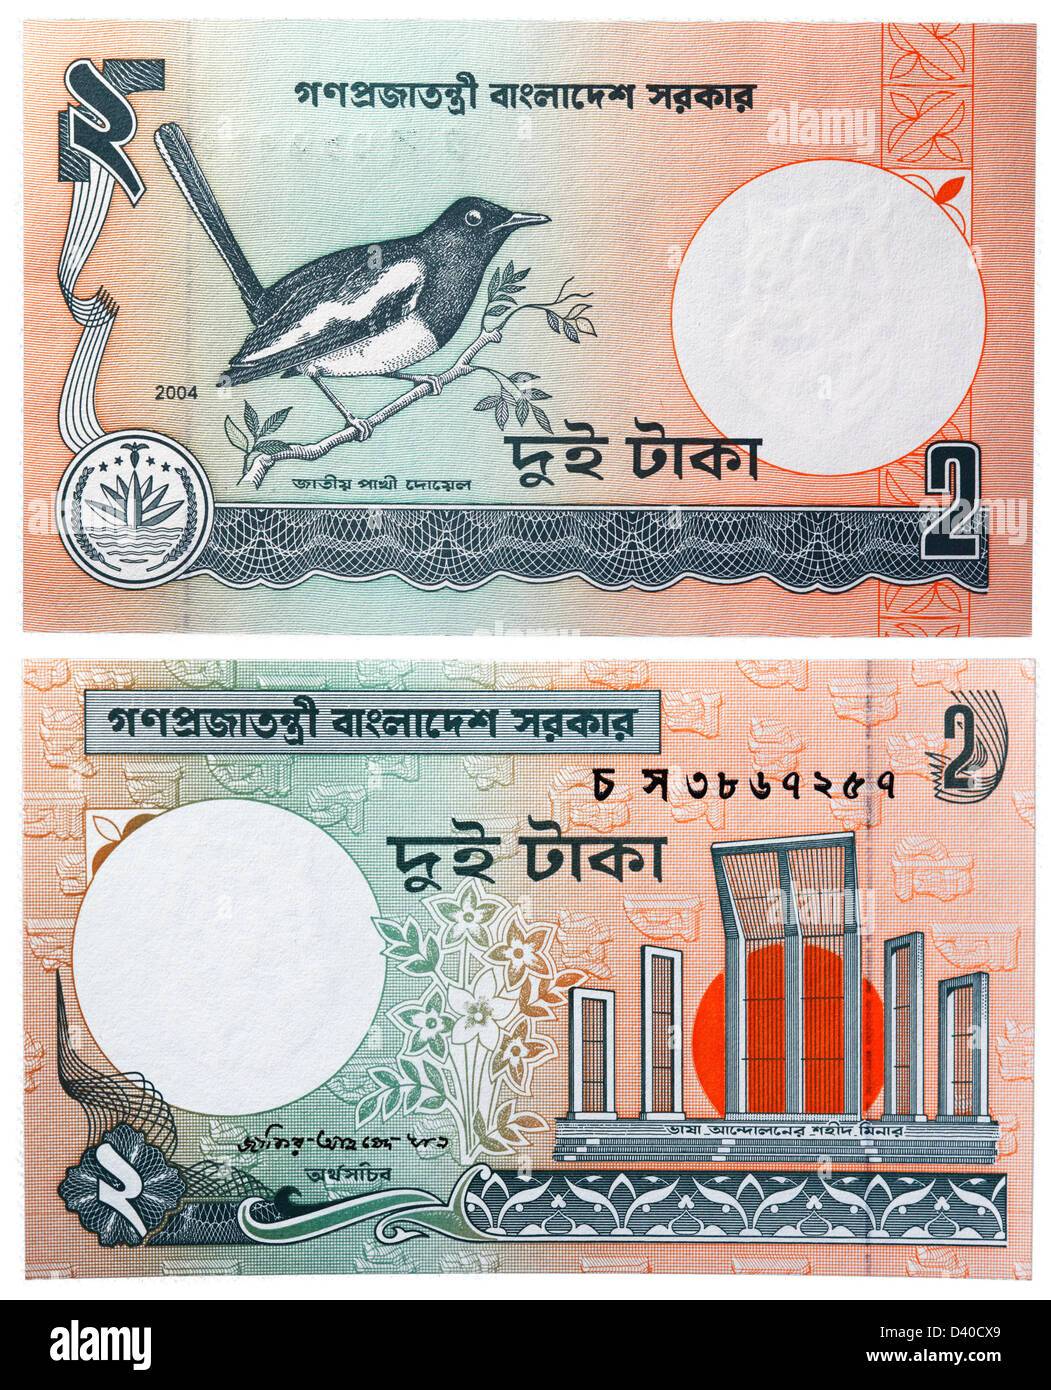 2 Taka banknote, Bangladesh, 2004 - Stock Image